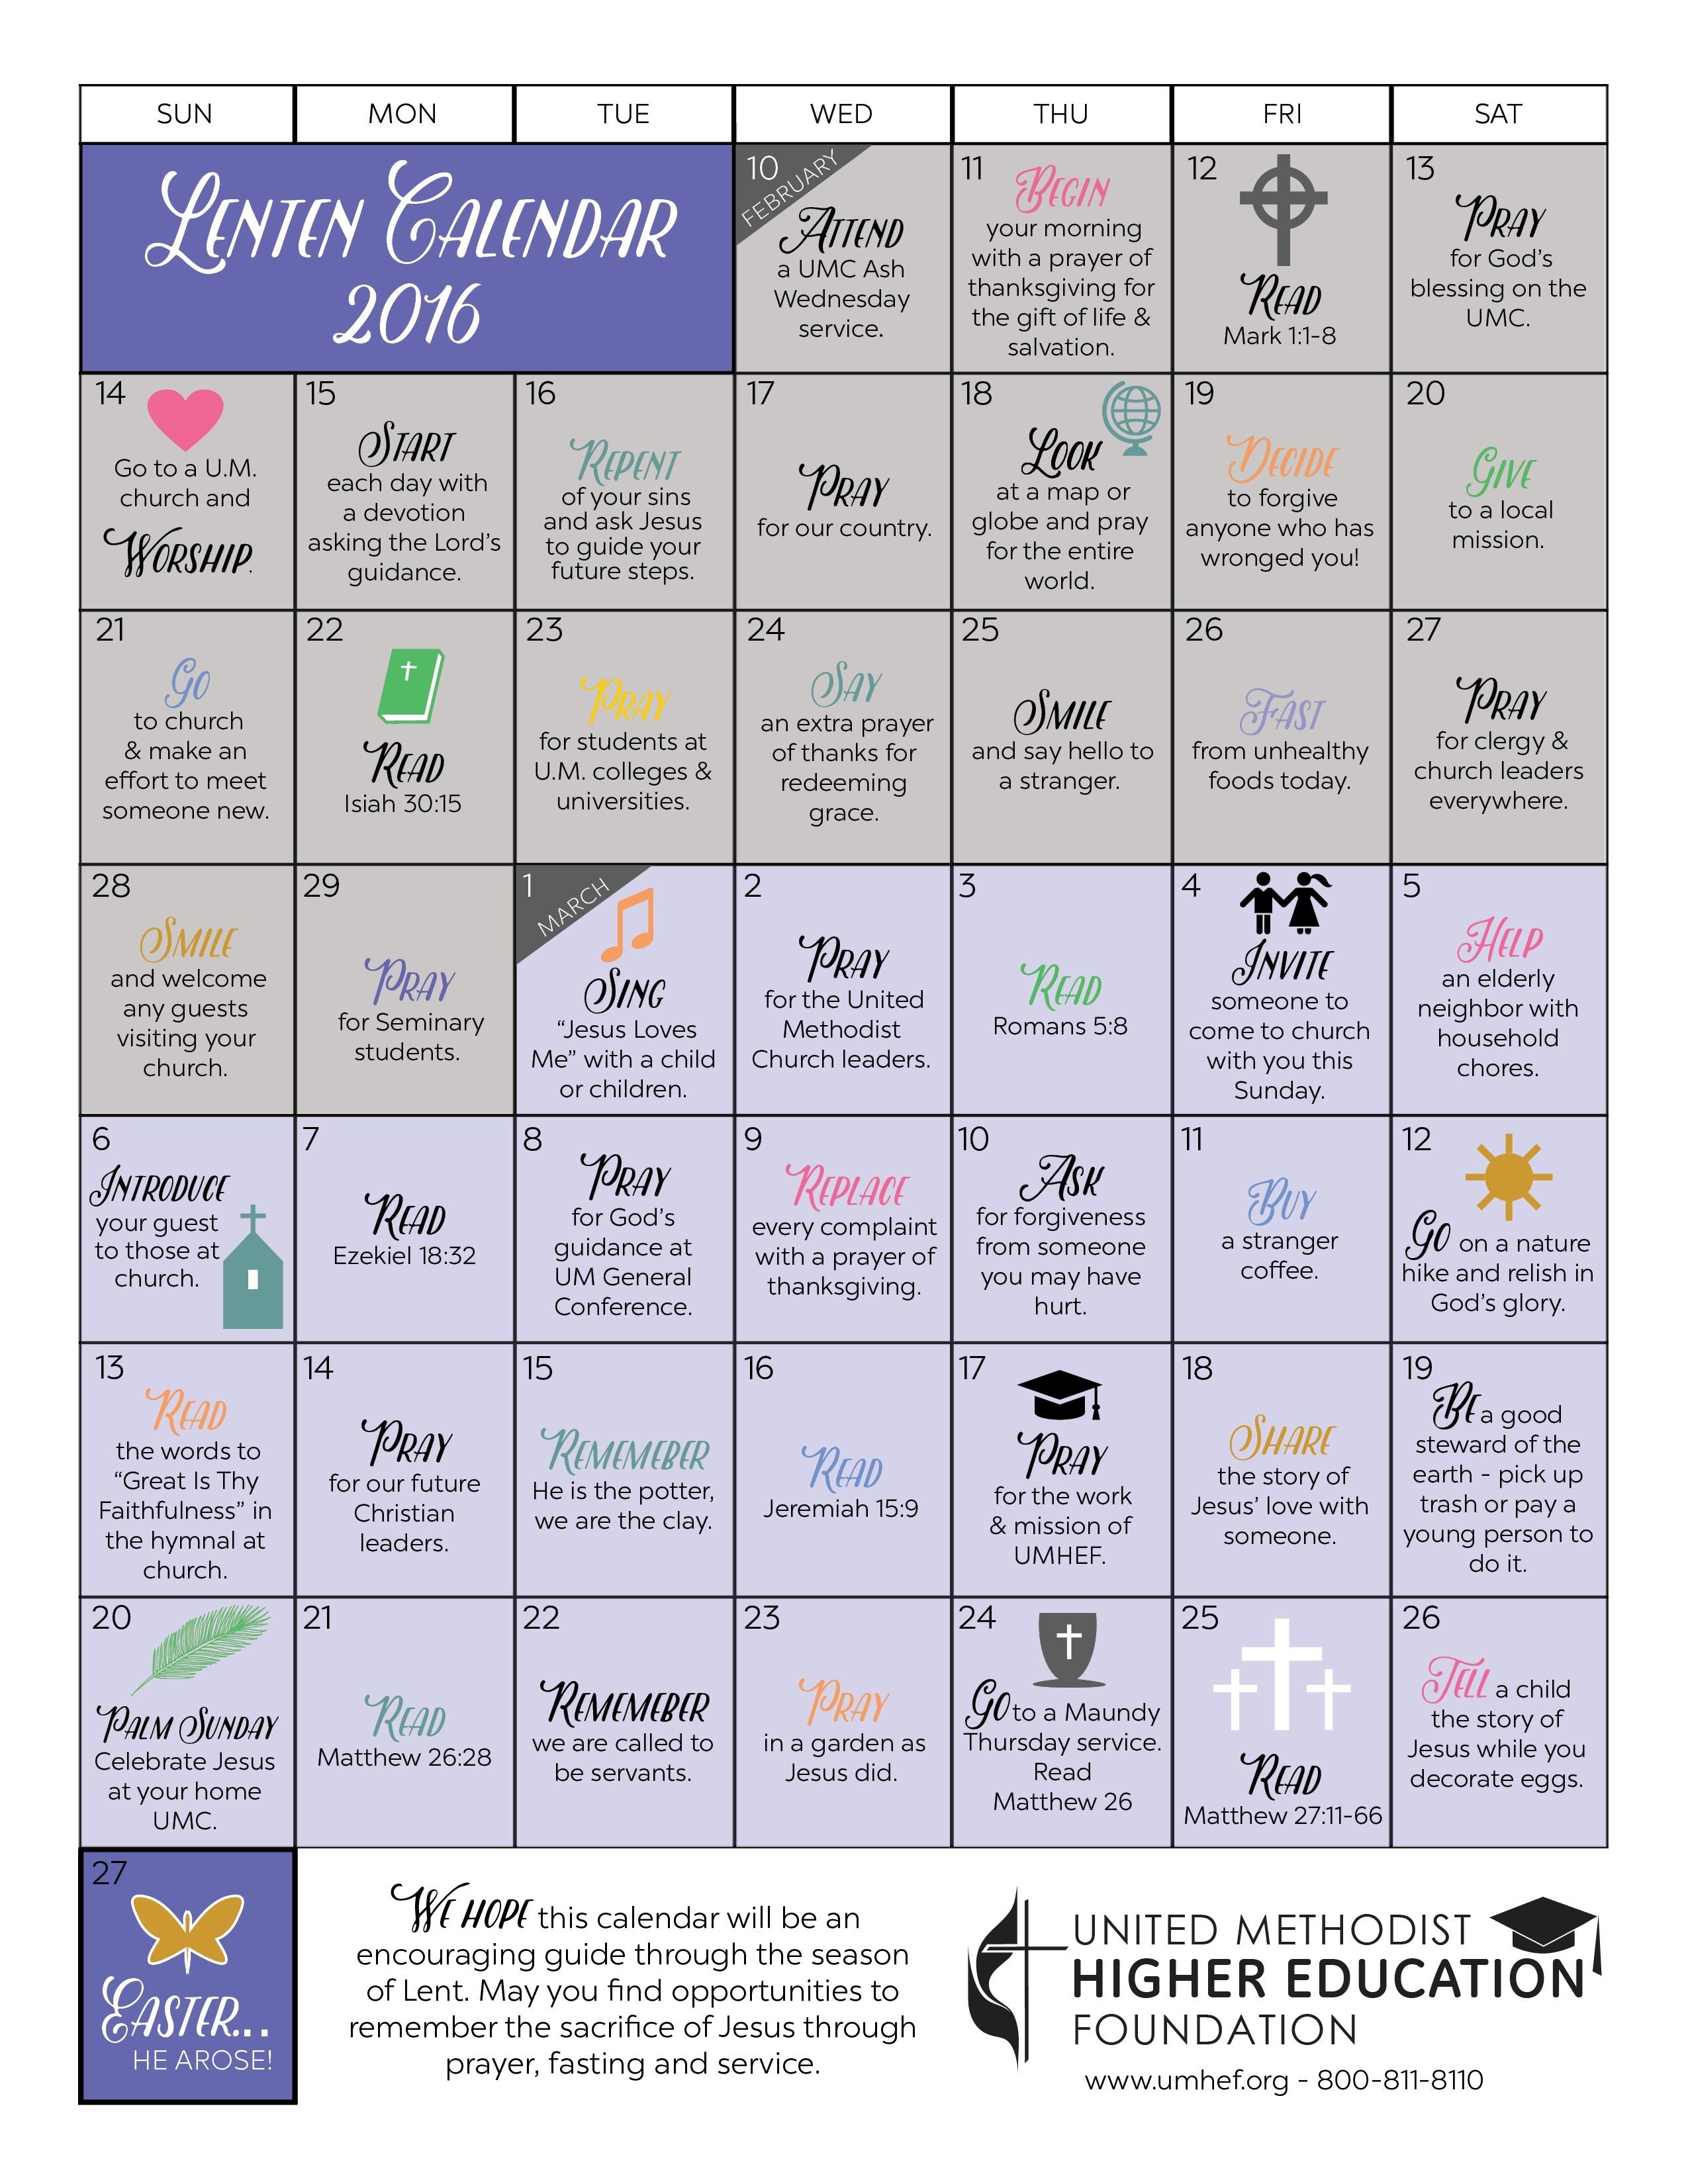 Printable Lent Calendar United Methodist Higher Education Foundation